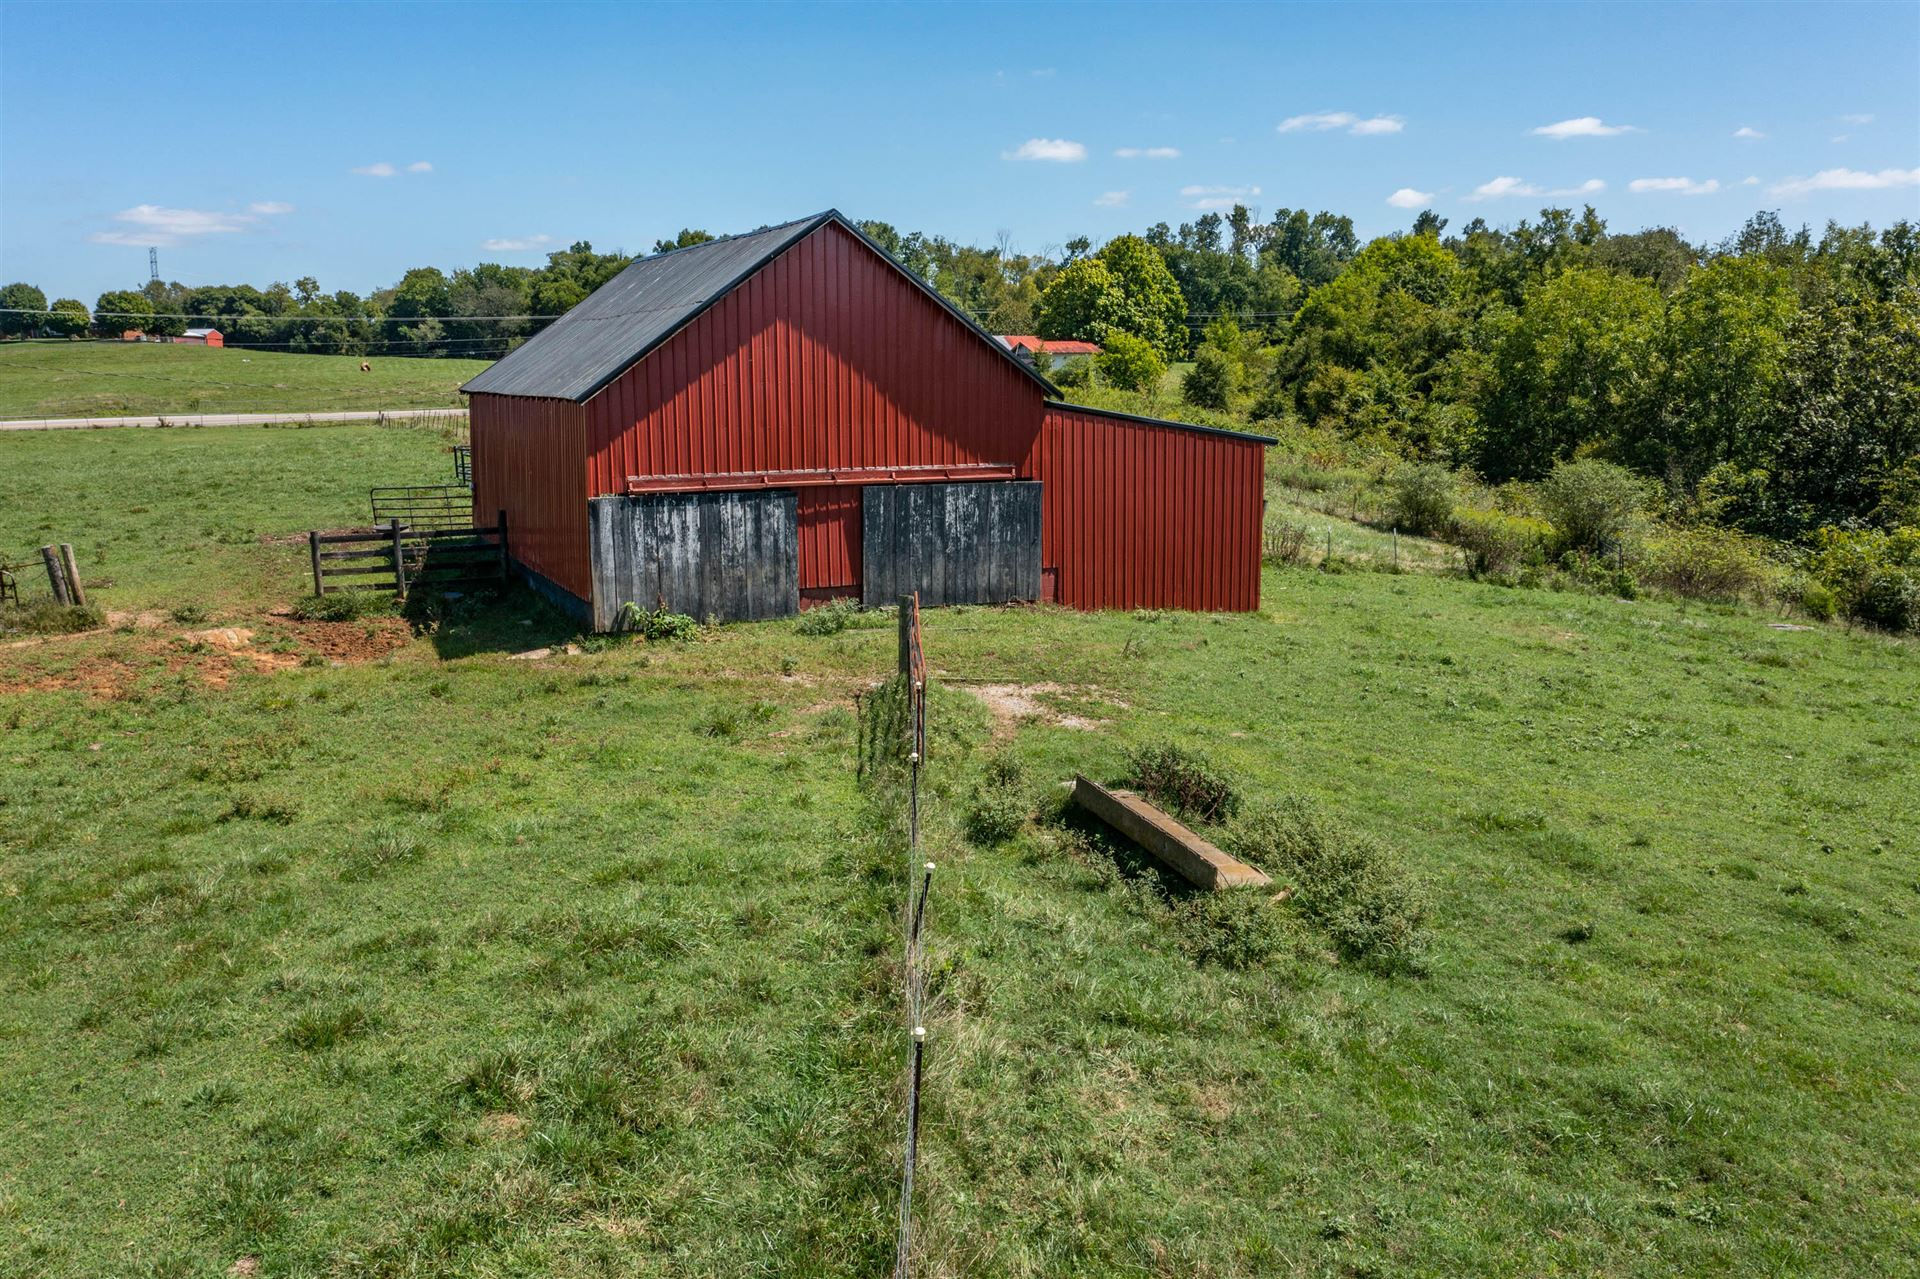 Photo of Tbd Lonesome Pine Trail, Greeneville, TN 37743 (MLS # 9928474)